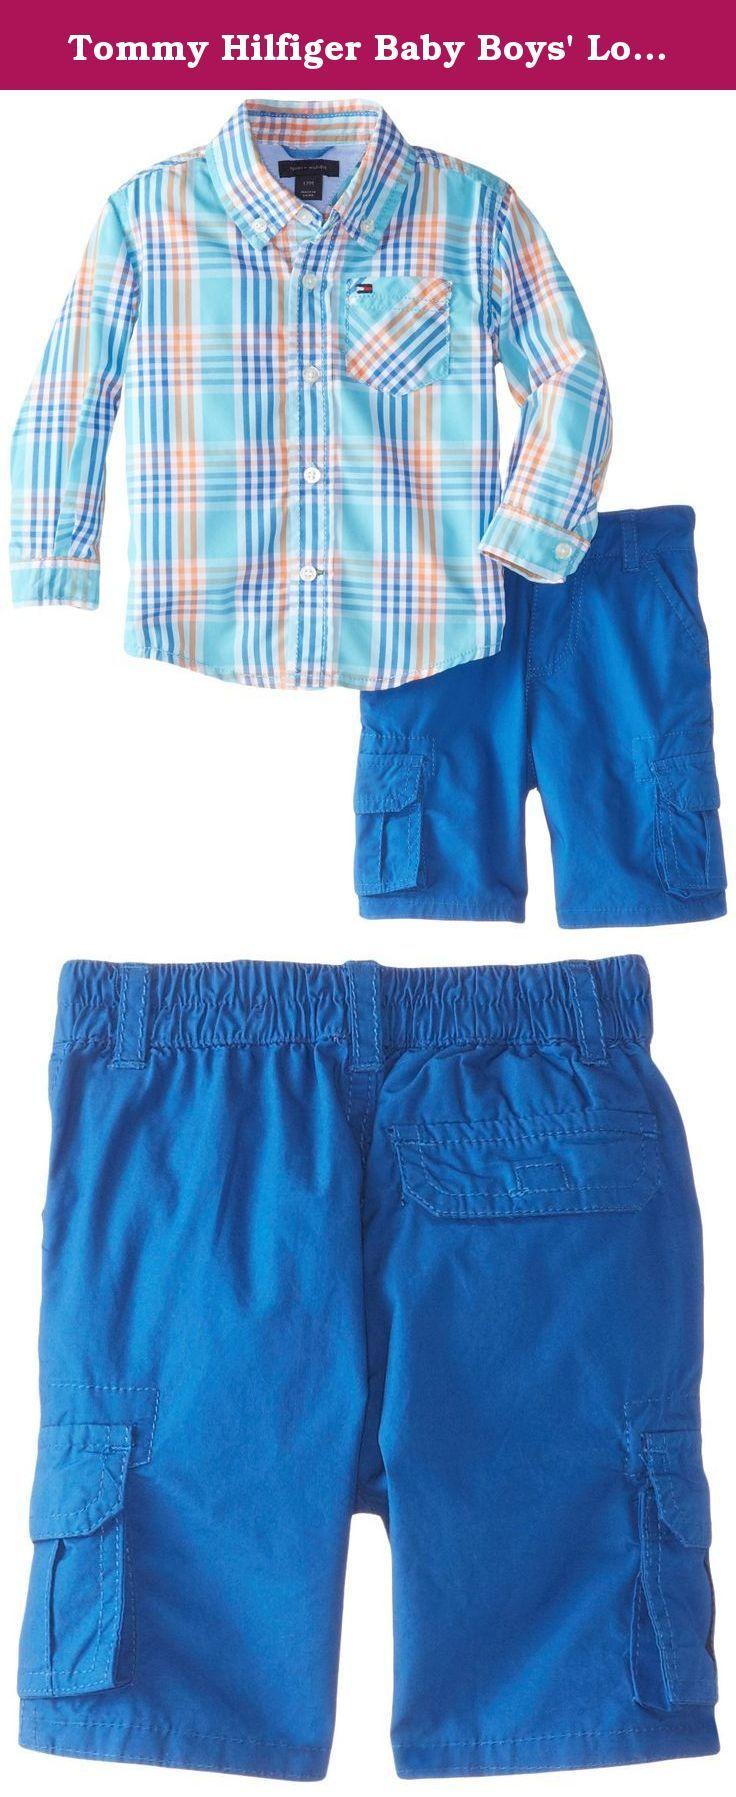 Tommy Hilfiger Baby Boys' Long Sleeve Poplin Plaid Shirt with Twill Cargo Short, Blue Jean, 24 Months. Captain long sleeve poplin plaid shirt with twill cargo short.